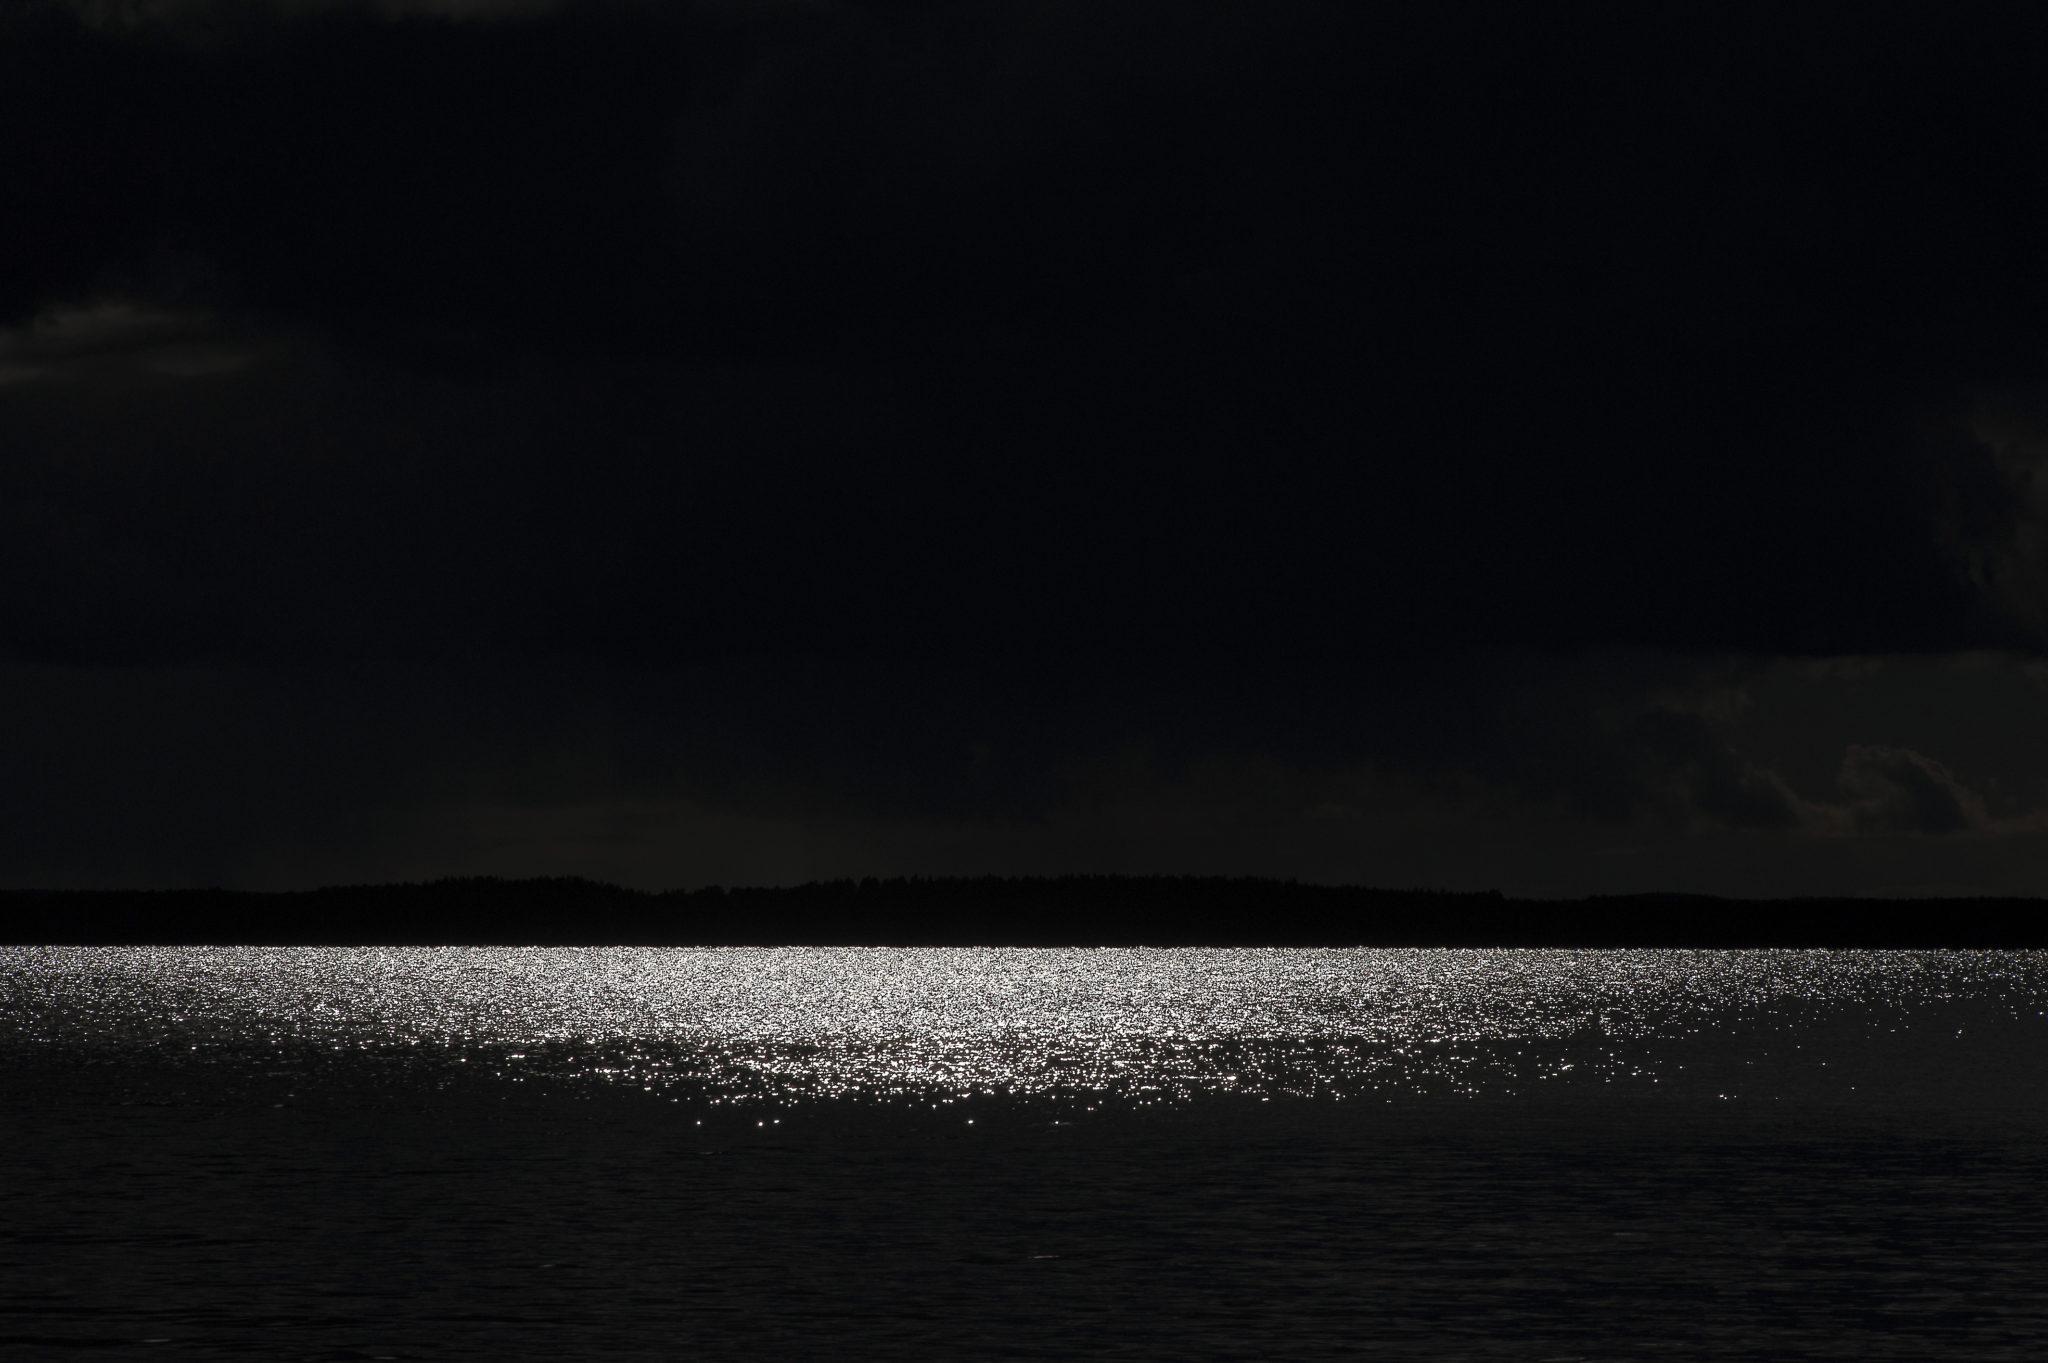 Auringon kilo illassa – Late Sunshine over the Lake